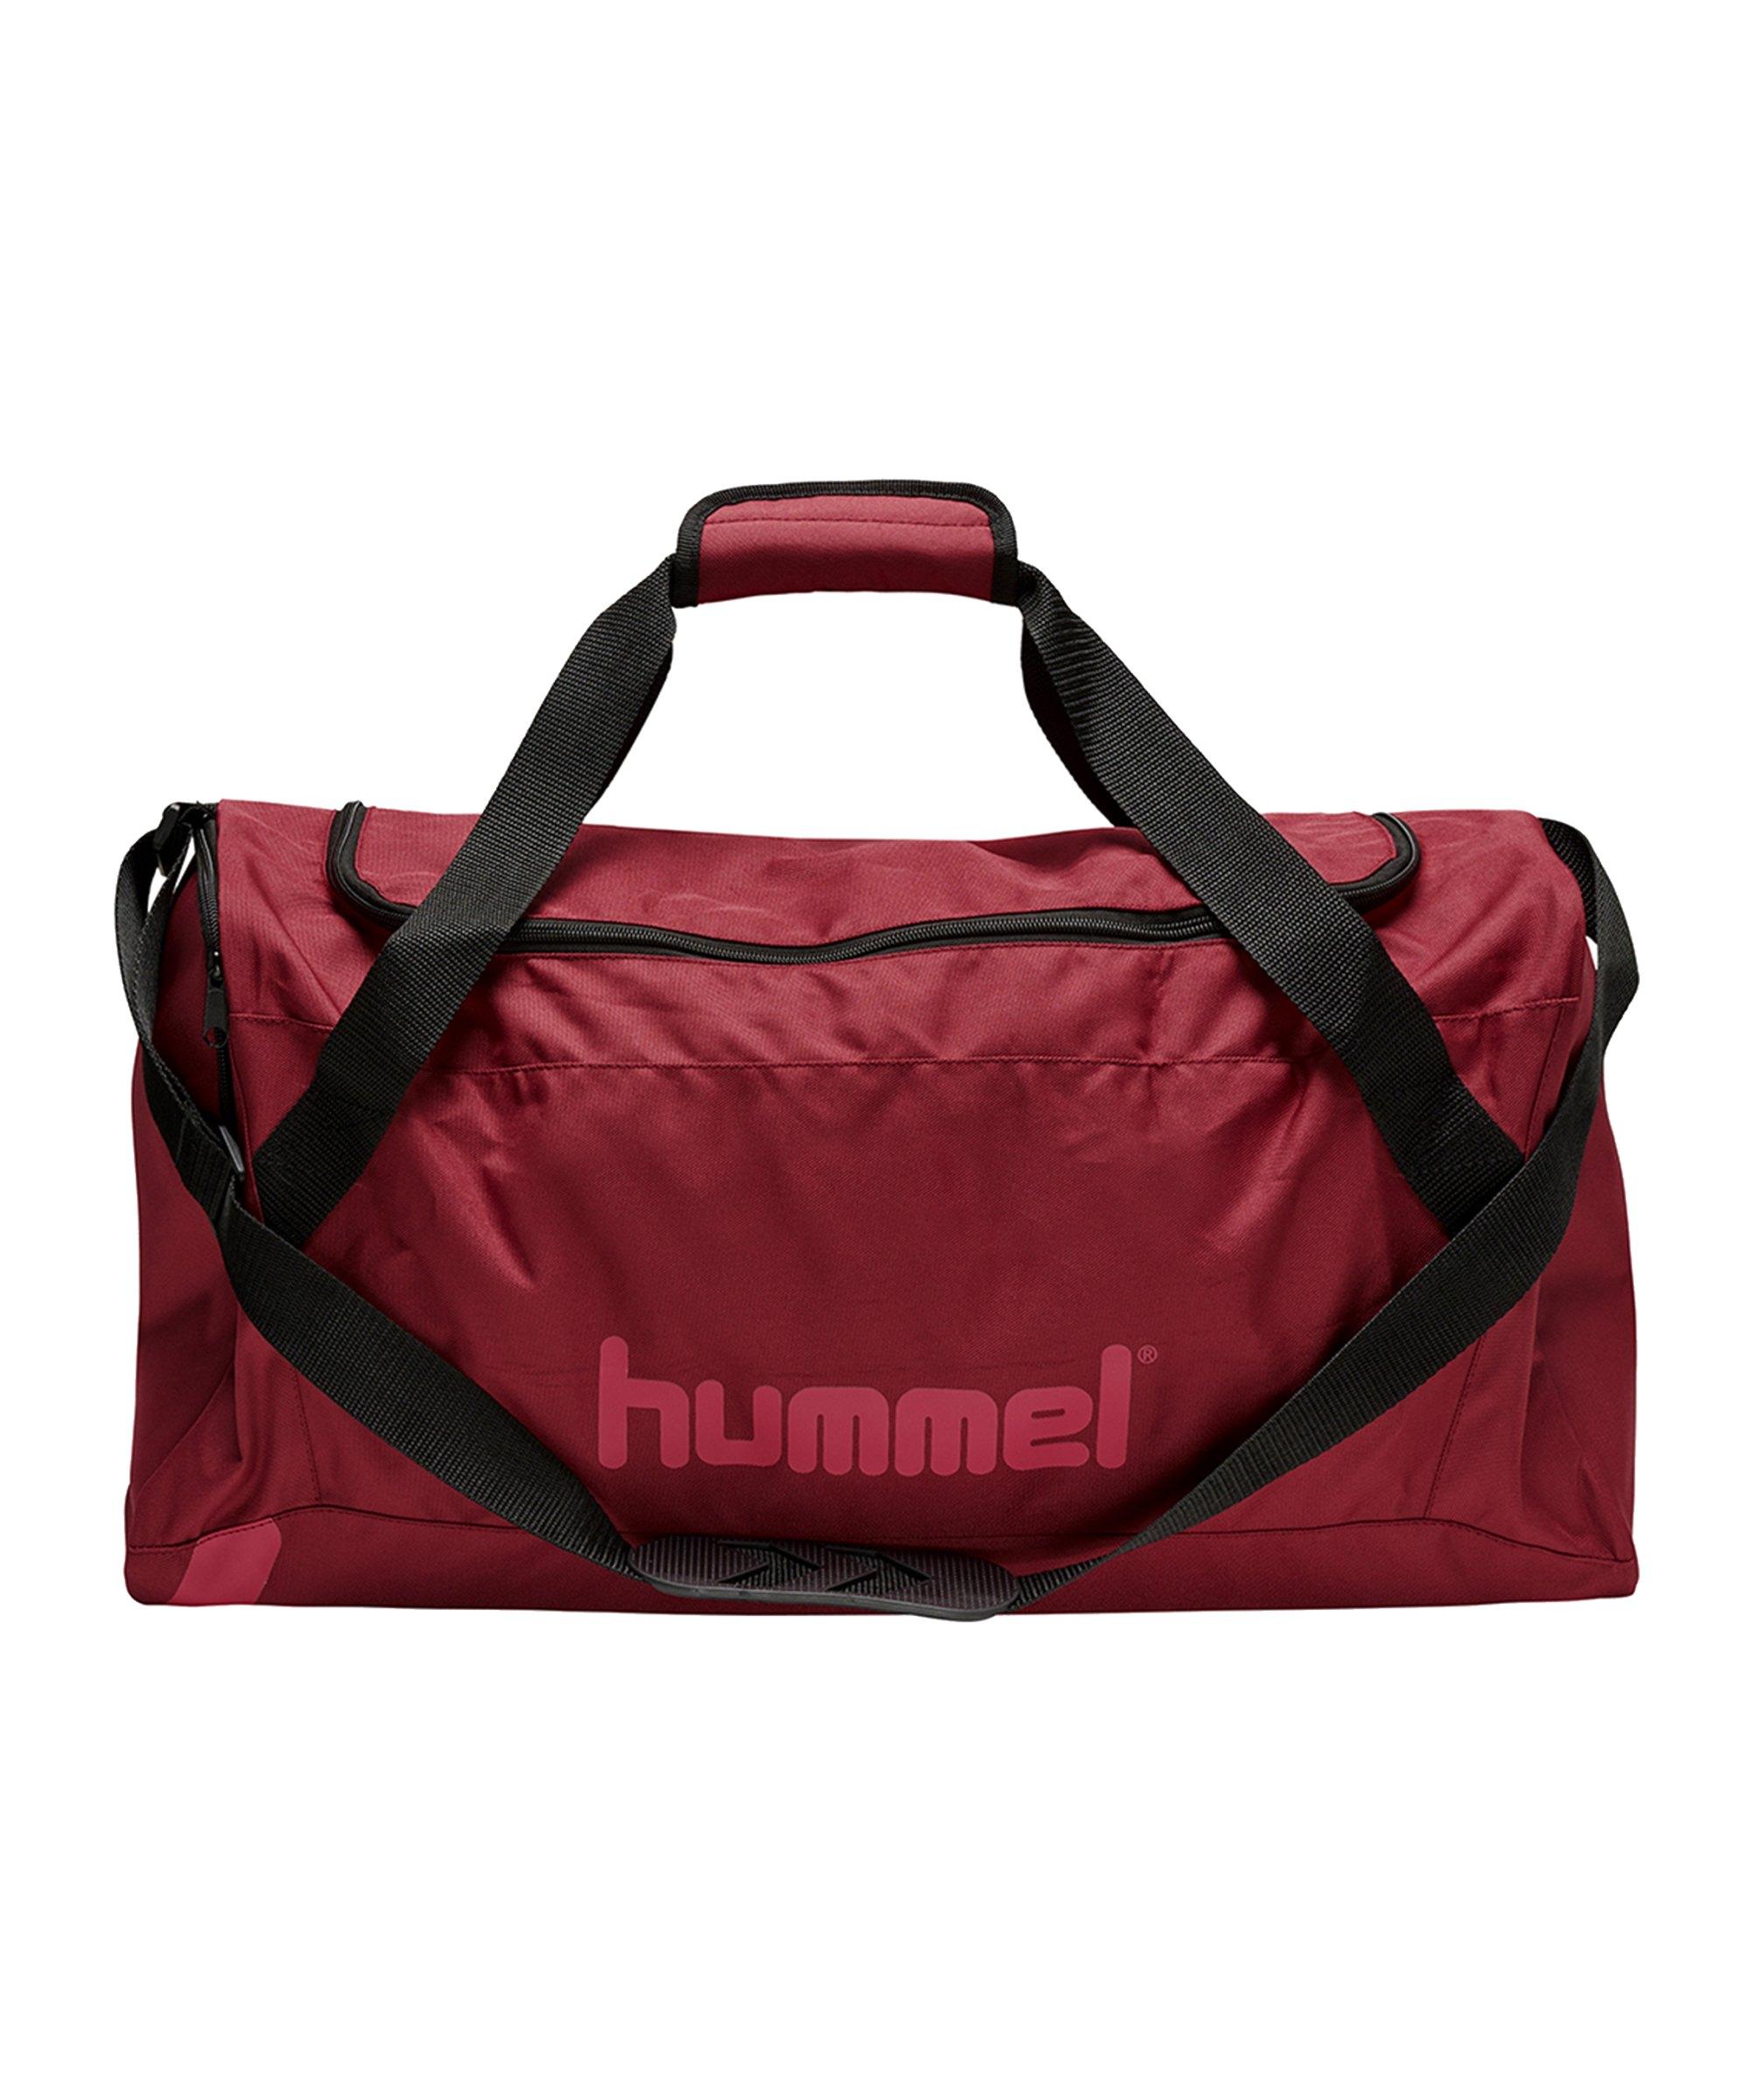 Hummel Core Bag Sporttasche Rot F3583 Gr. XS - rot